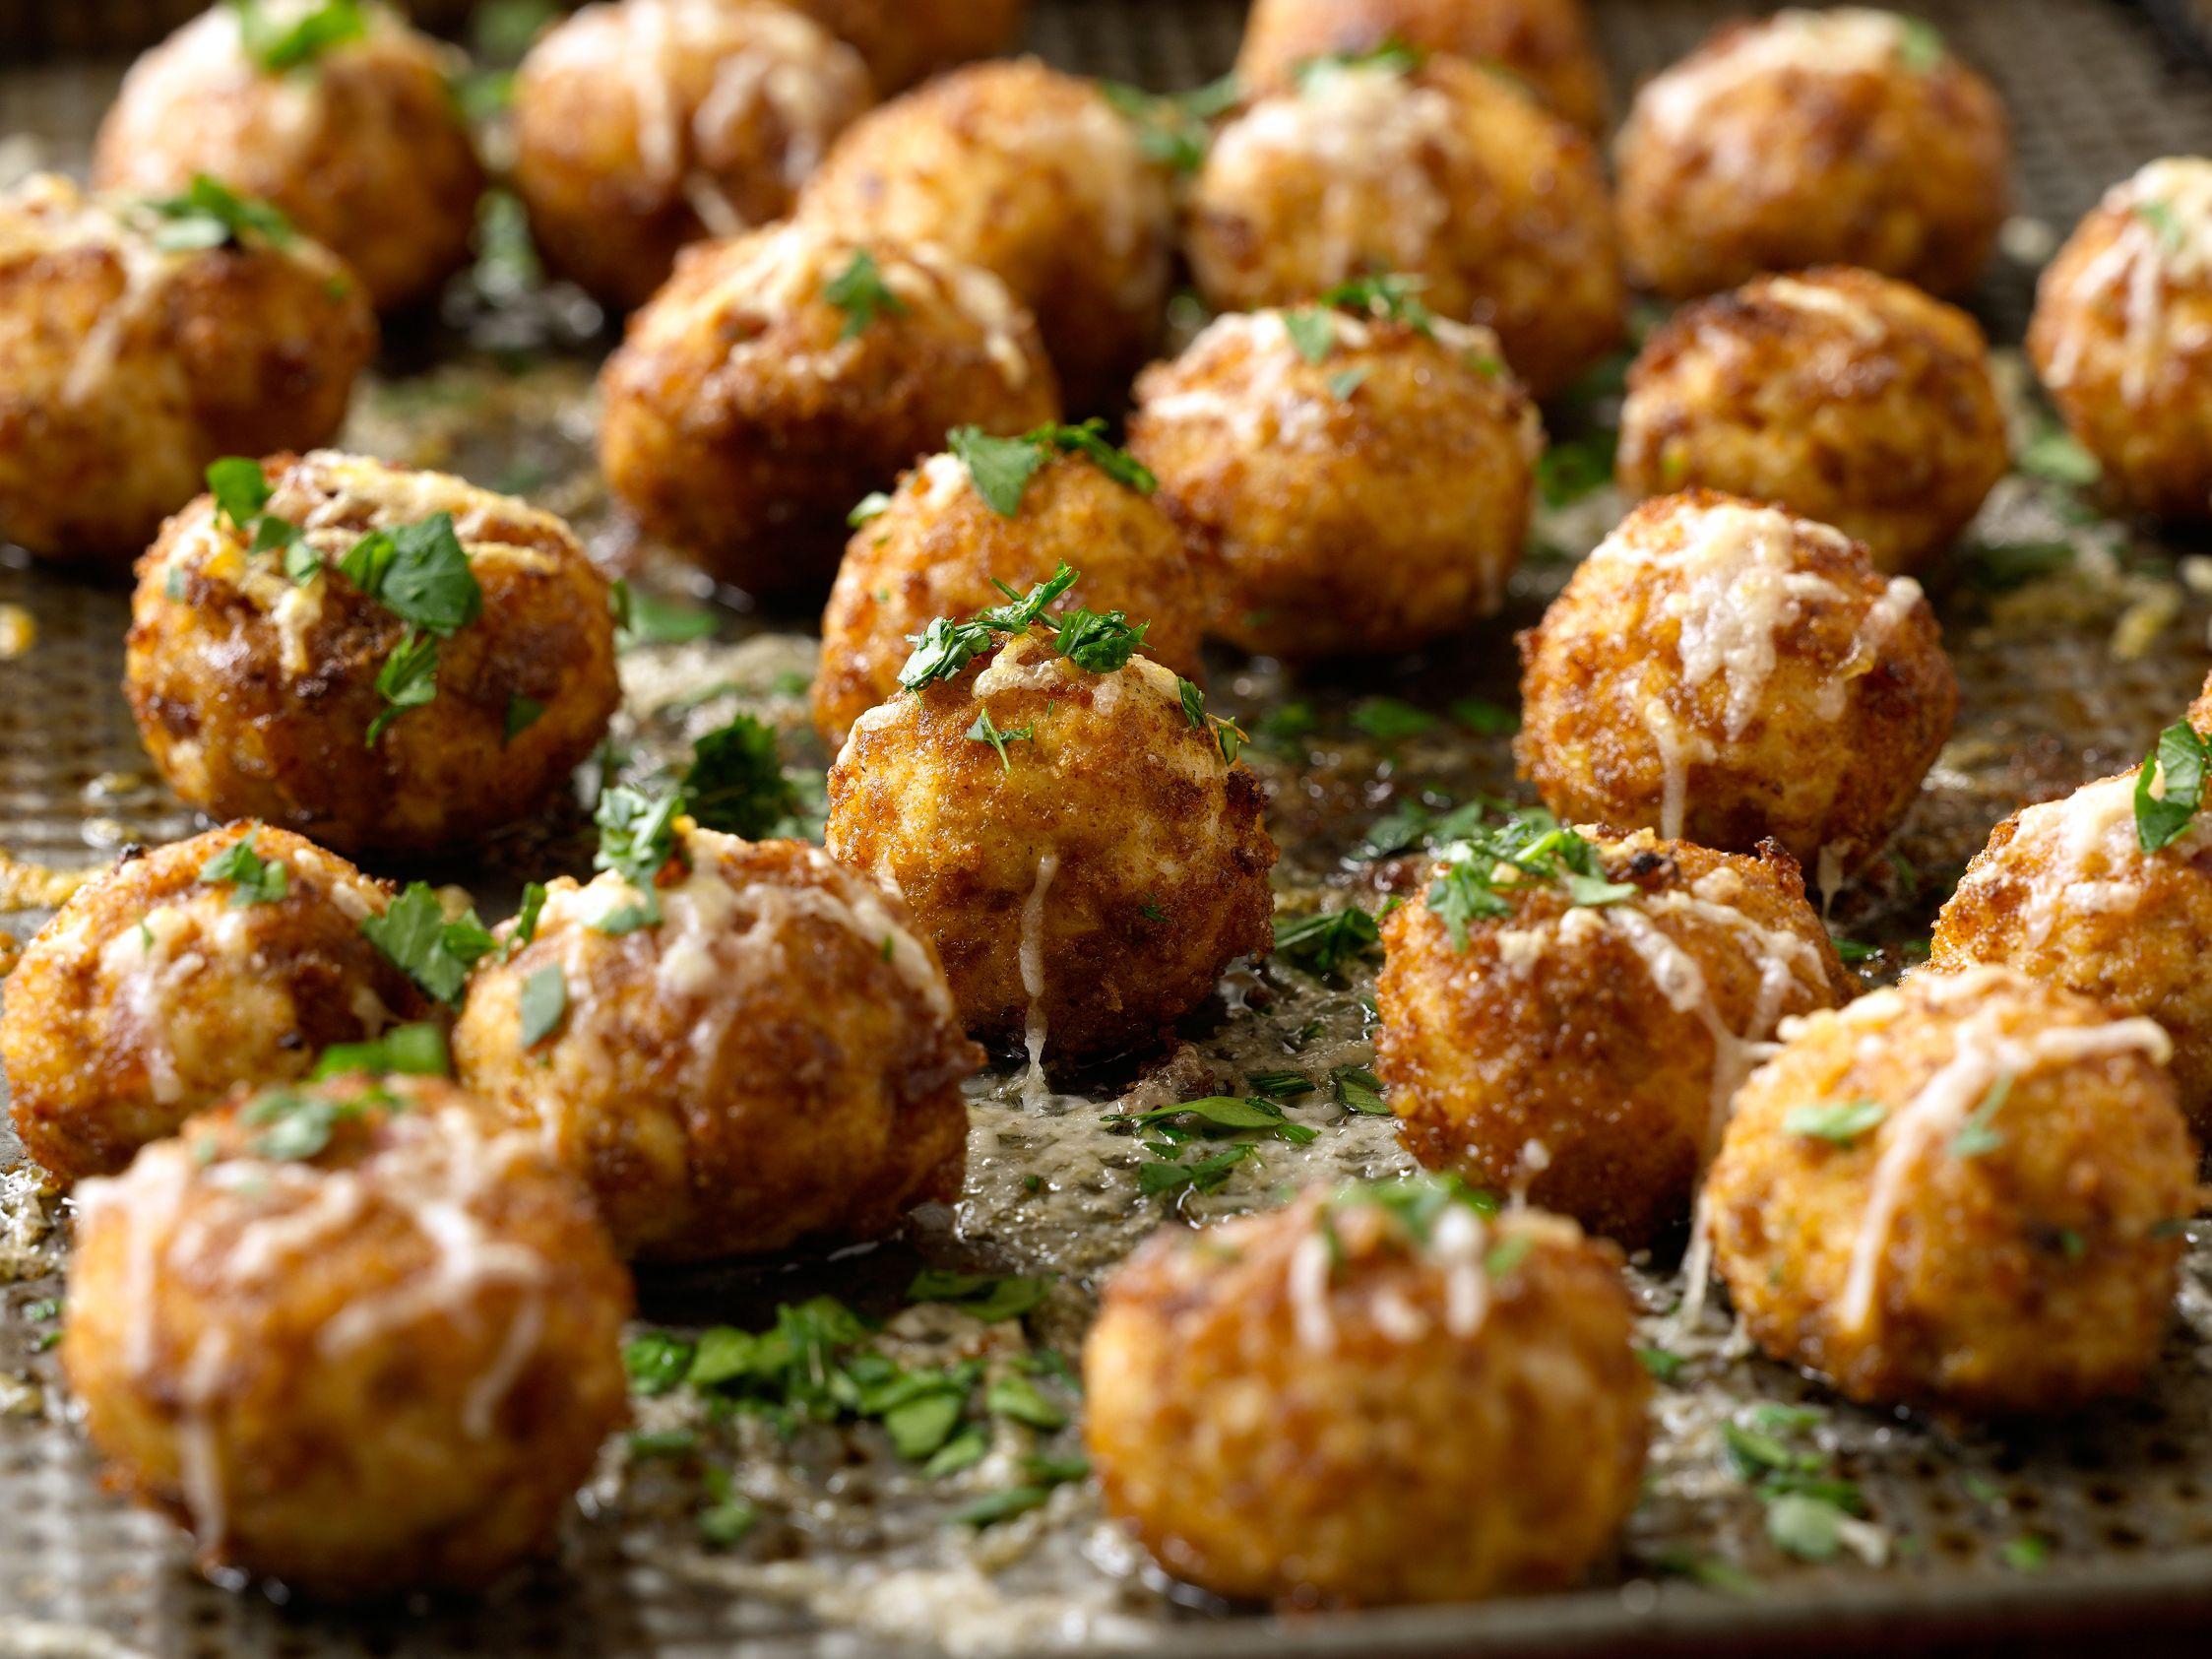 Chicken meatballs recipe melissa darabian food network chicken meatballs recipe melissa darabian food network foodnetwork forumfinder Images